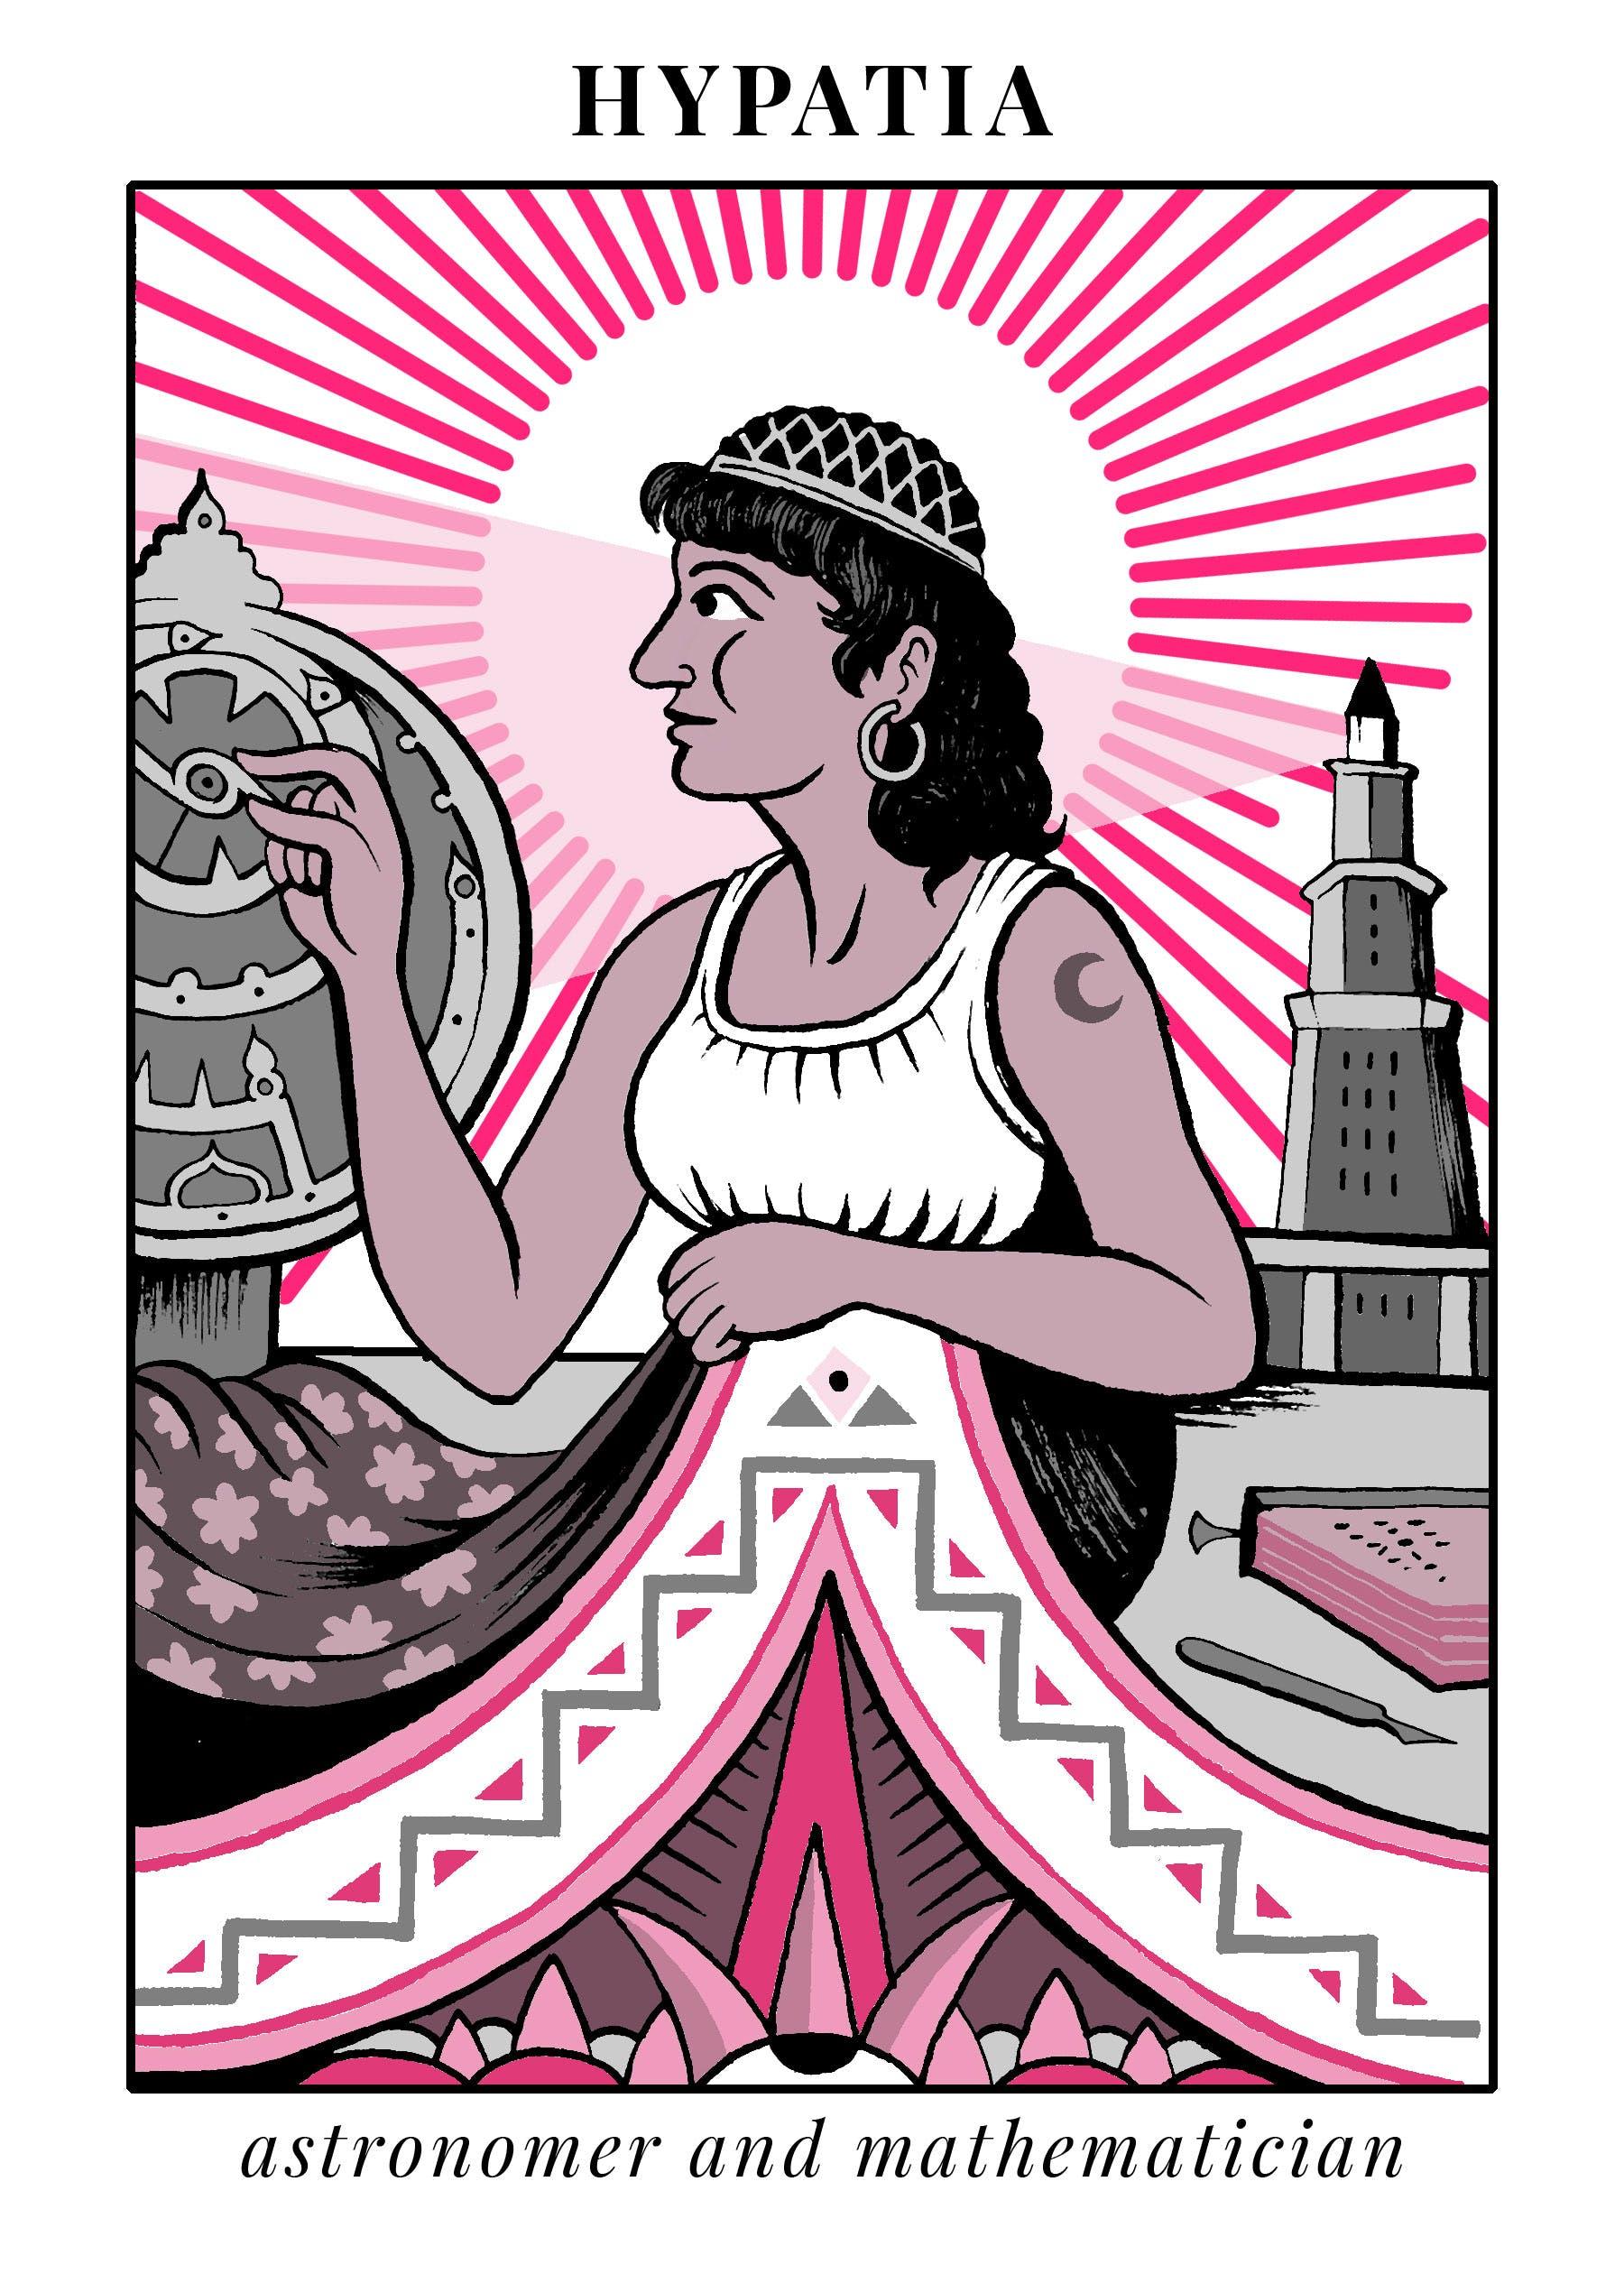 Hypatia the Mathematician.